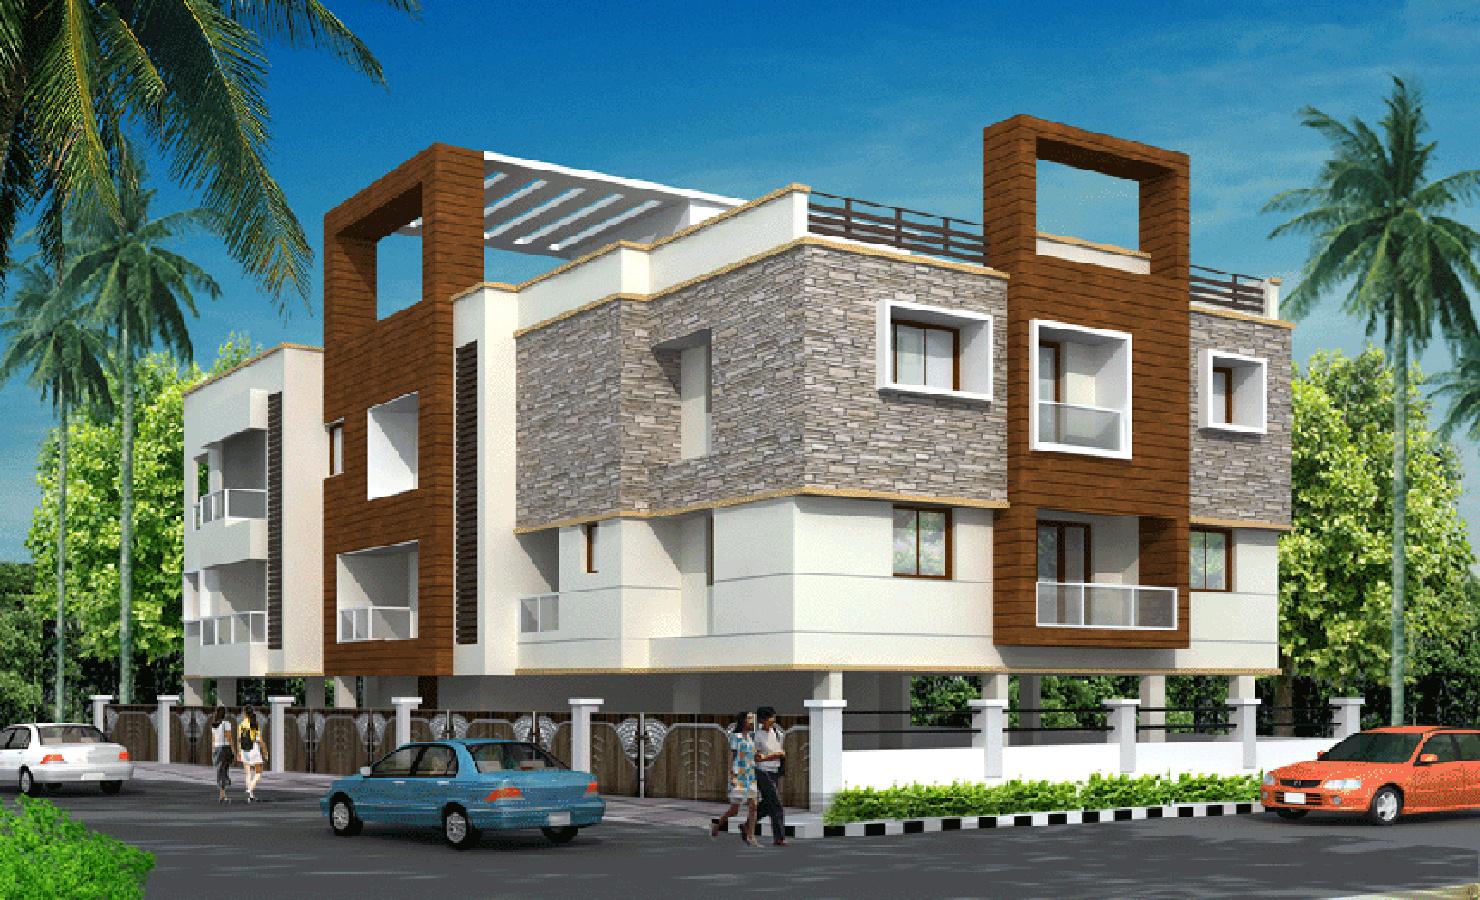 2 Floor Apartment Elevation : Main elevation image of subiksha trinity unit available